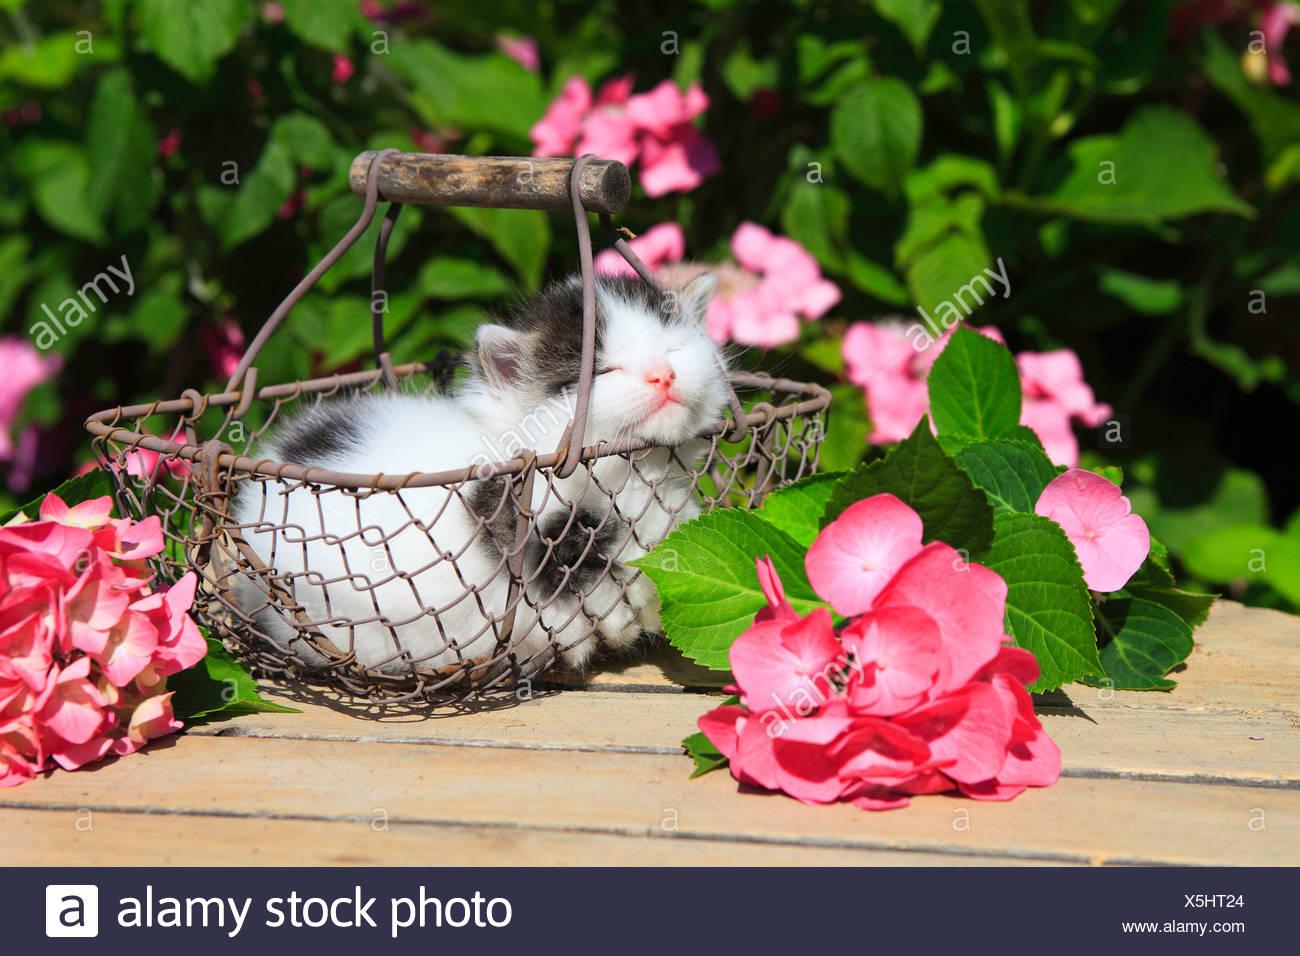 3 weeks, flower, flowers, garden, house, home, Animal, domestic animal, pet, young, cat, basket, kitten, baskets, tiredness, sle - Stock Image